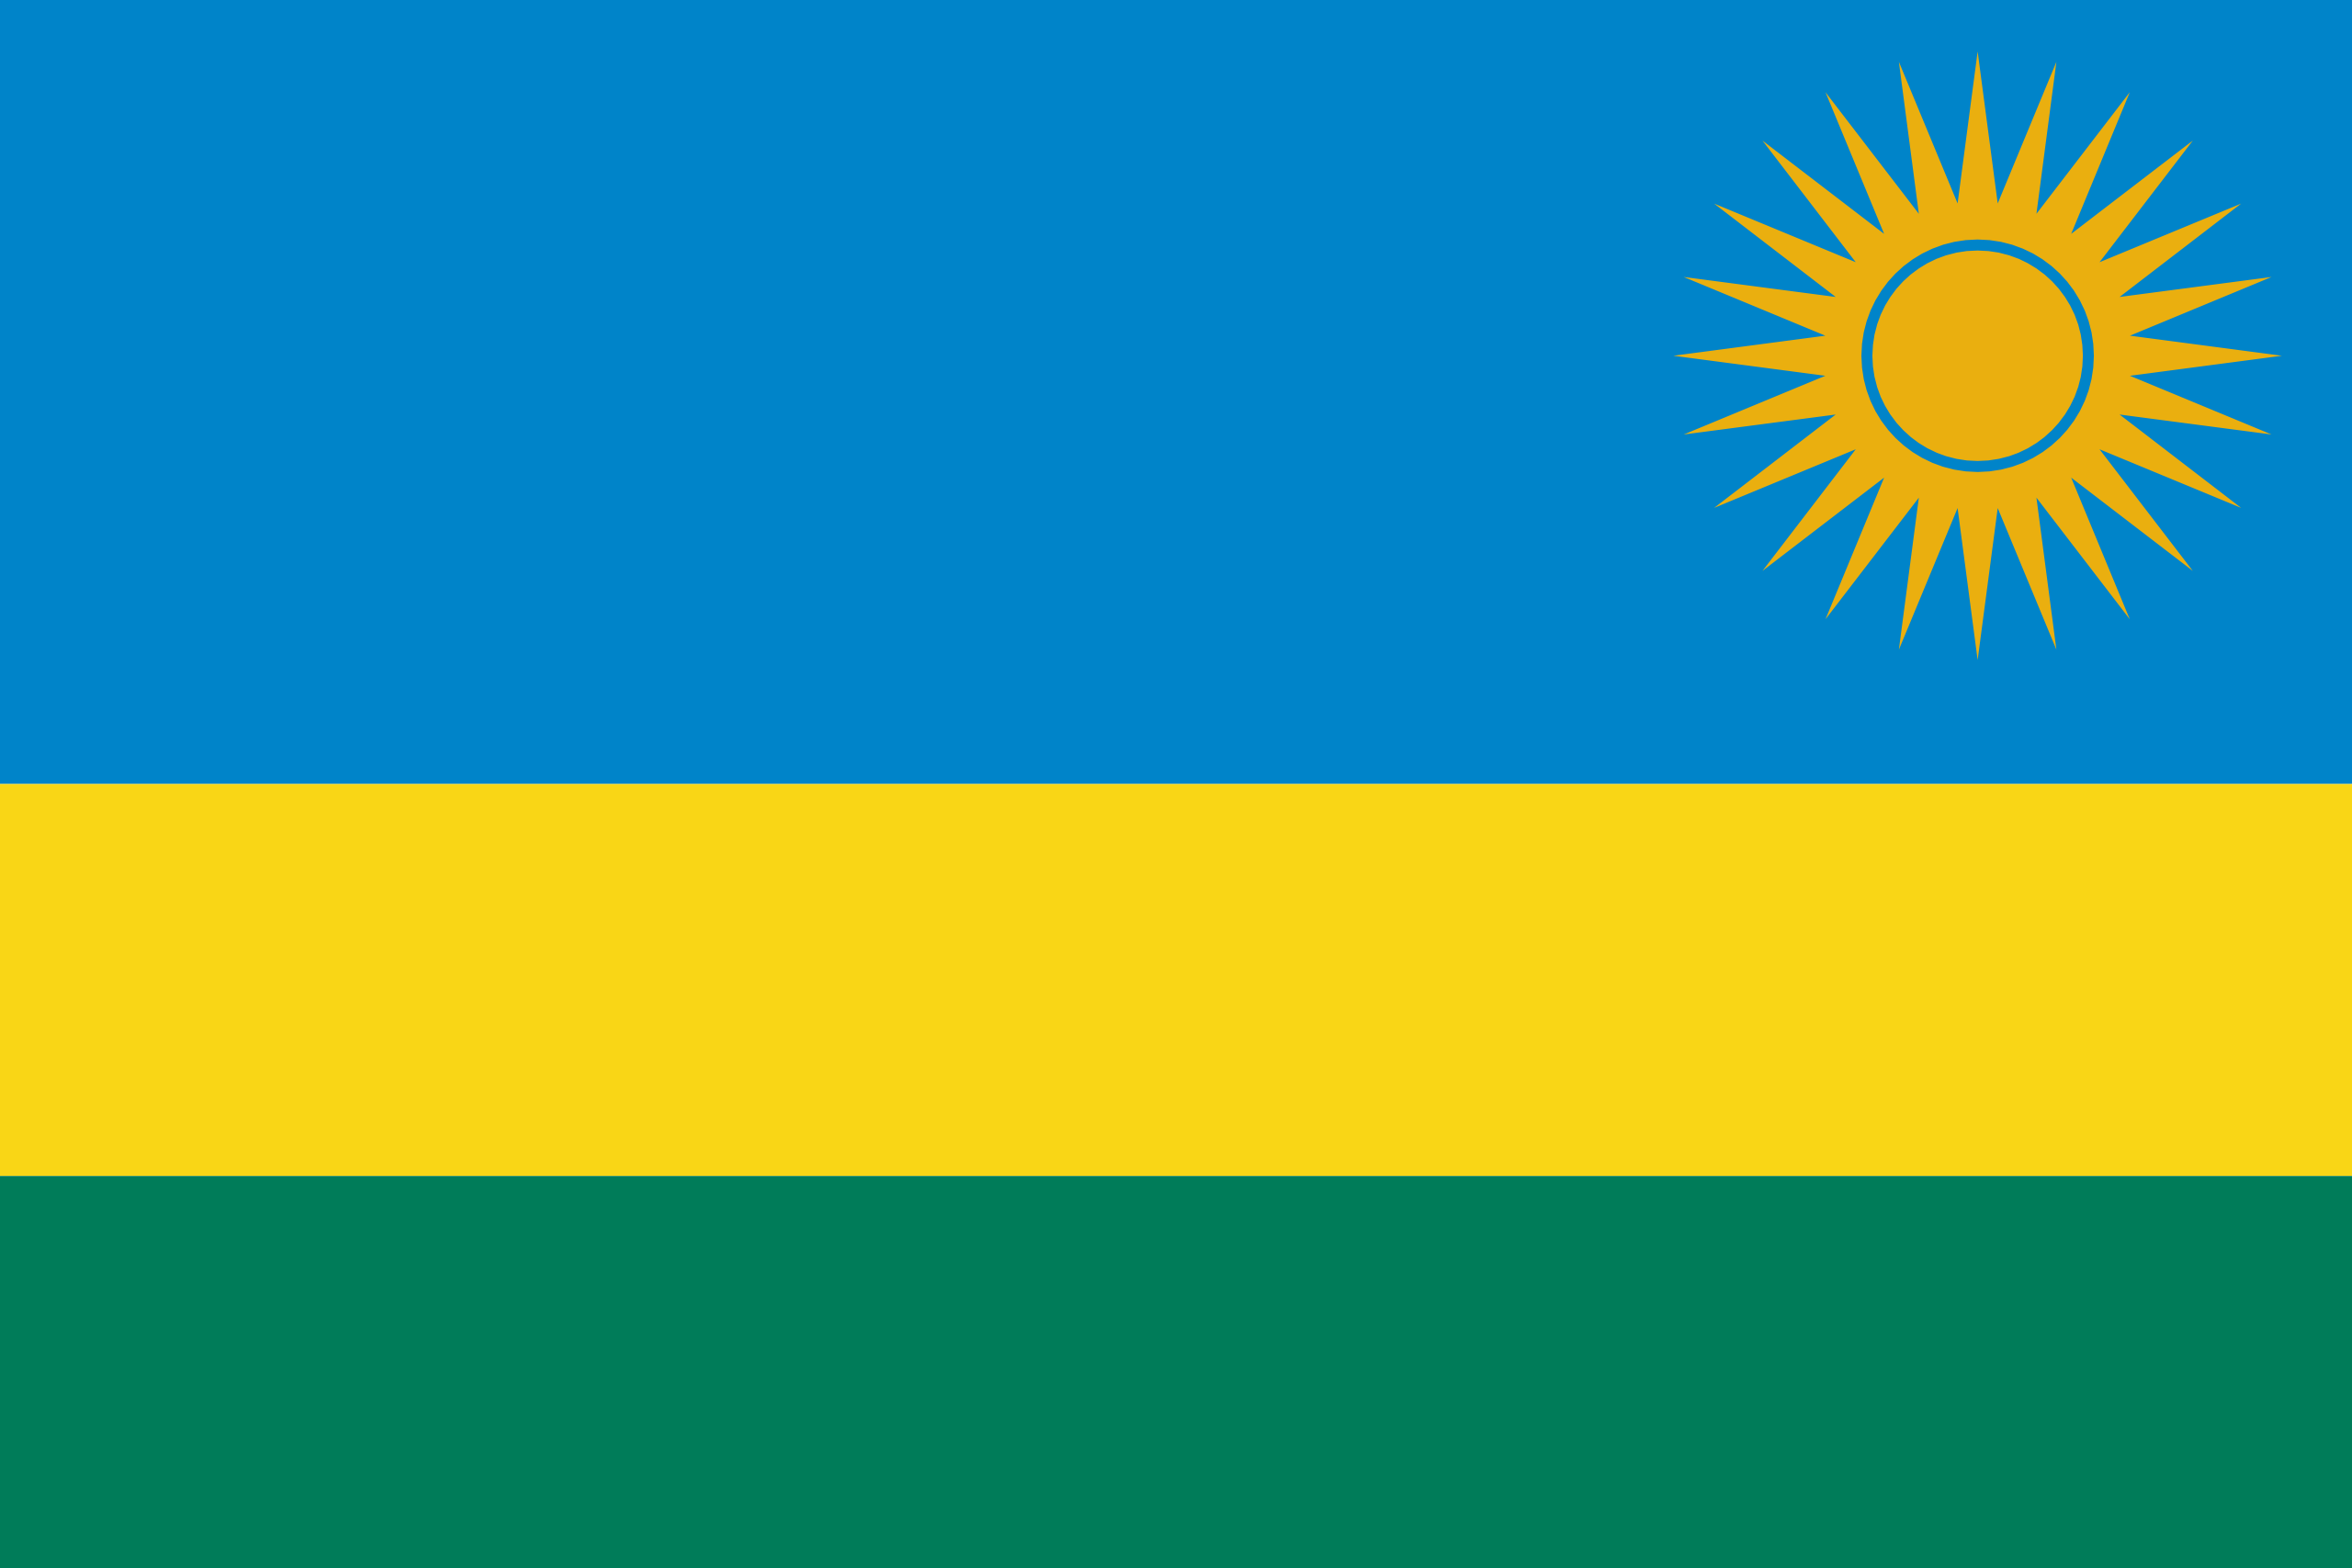 Ruanda, paese, emblema, logo, simbolo - Sfondi HD - Professor-falken.com